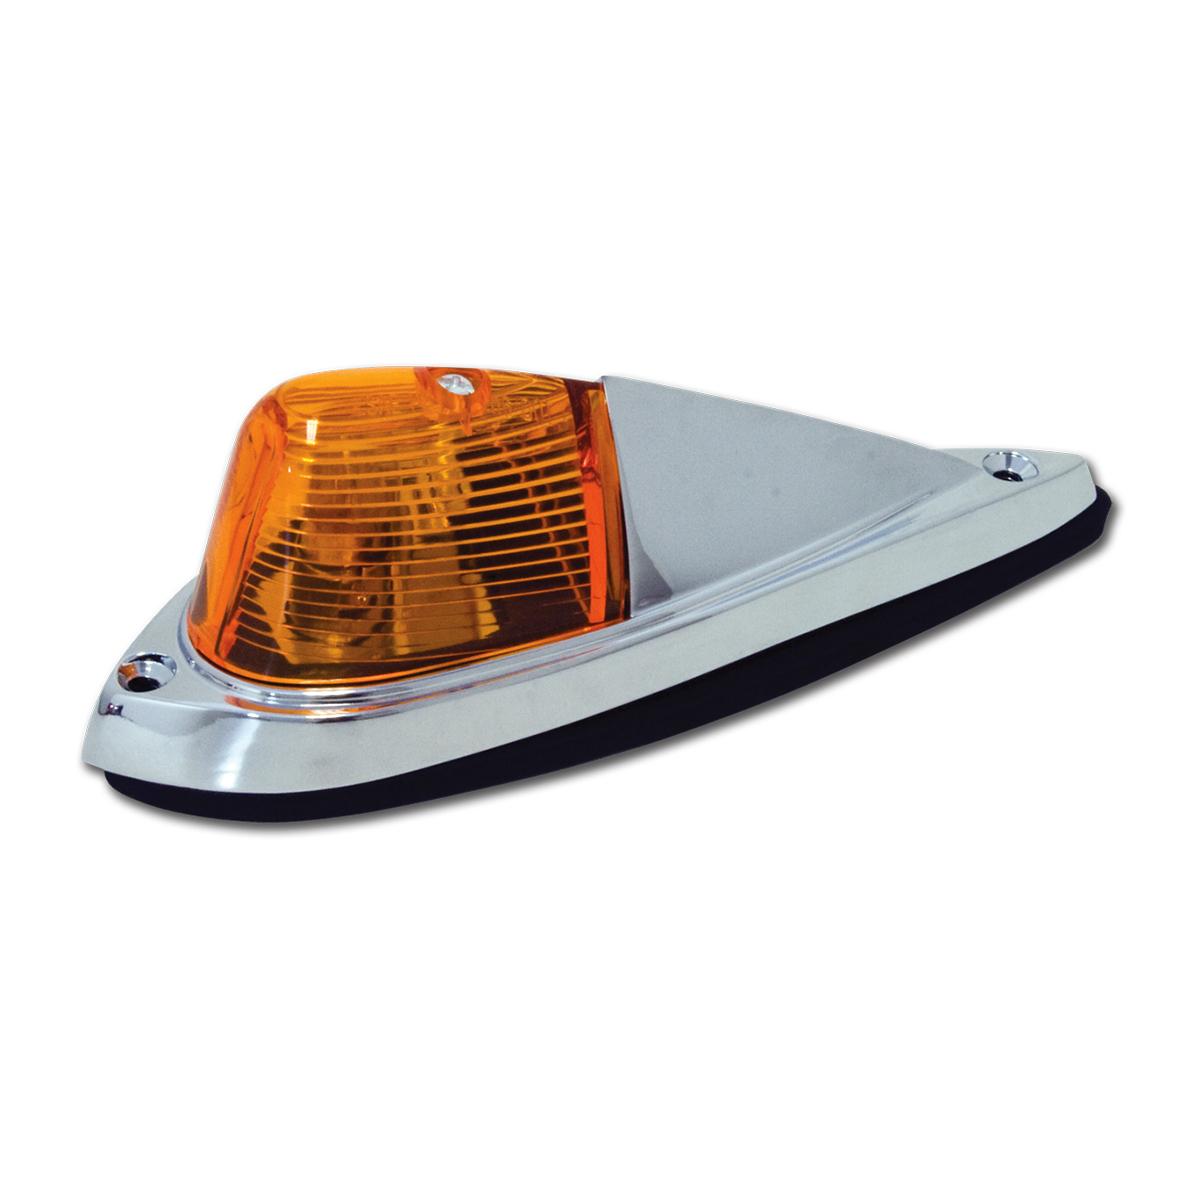 #80401 Amber Cab Light for Pick-Ups